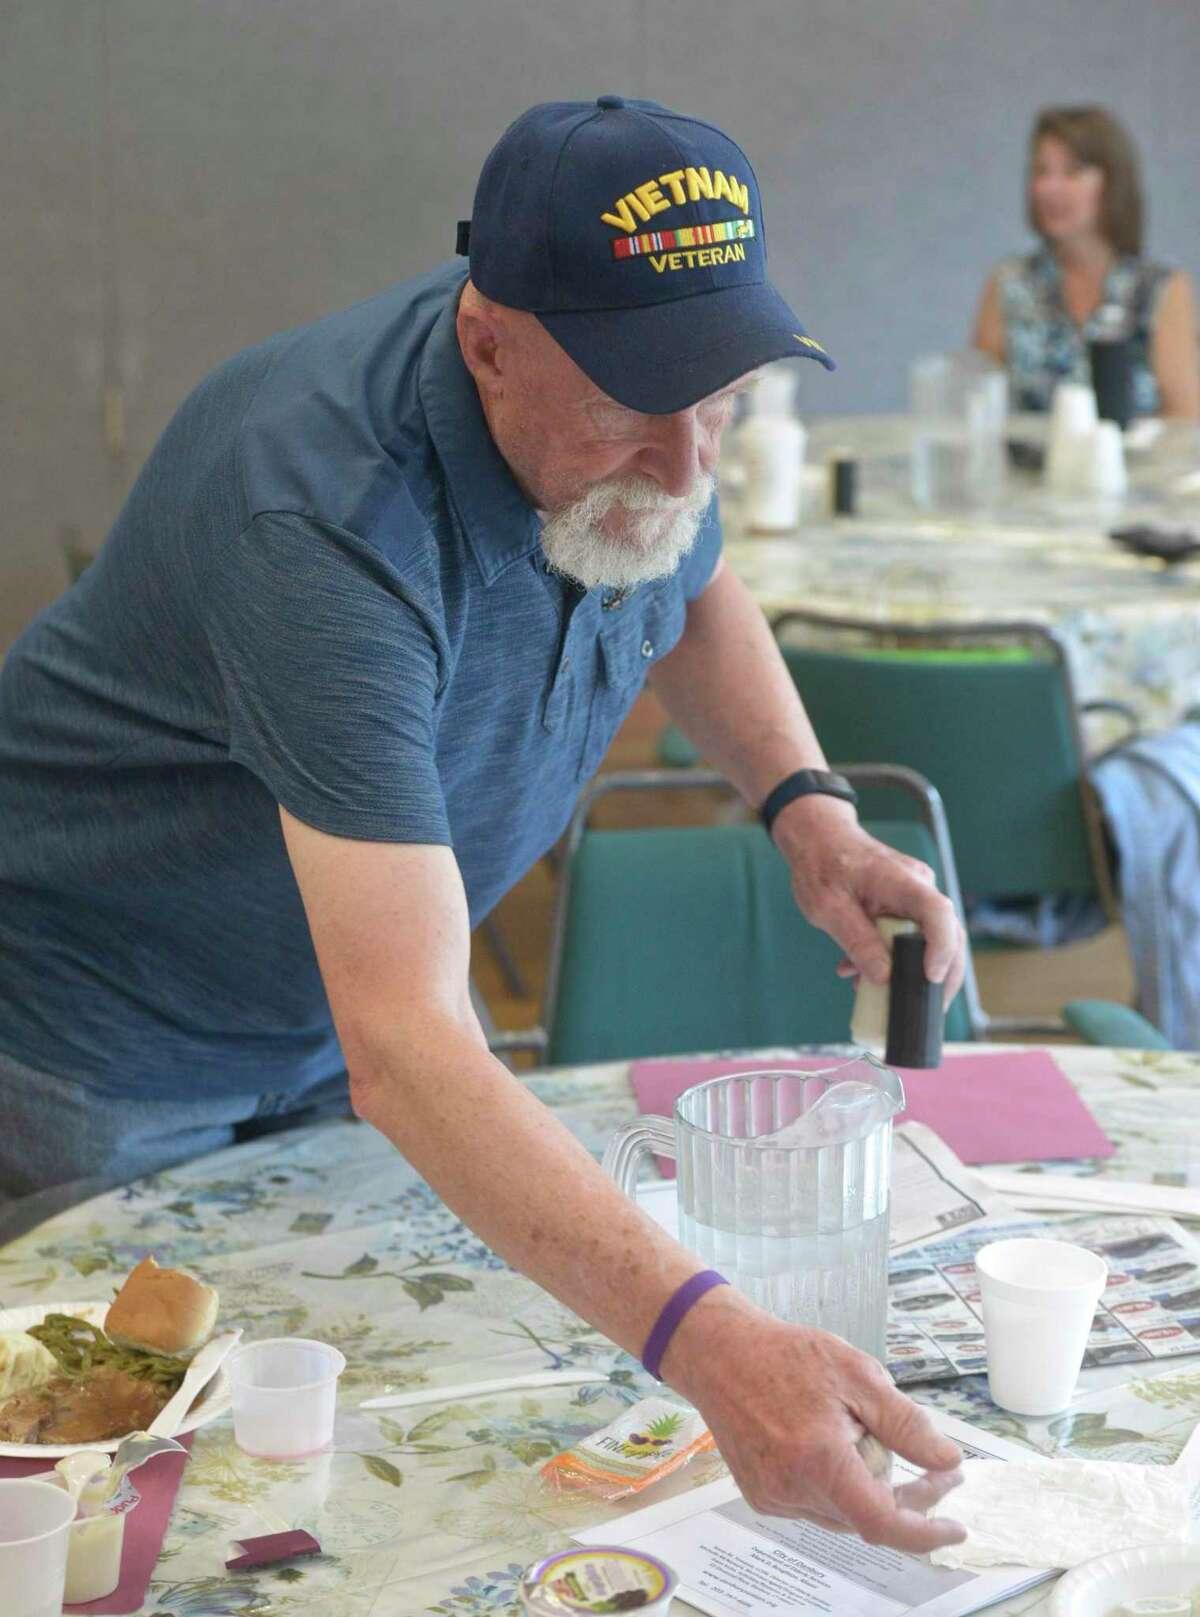 Paul Trudel volunteers at the Senior Center on Friday, June 7, 2019, in Danbury, Conn.